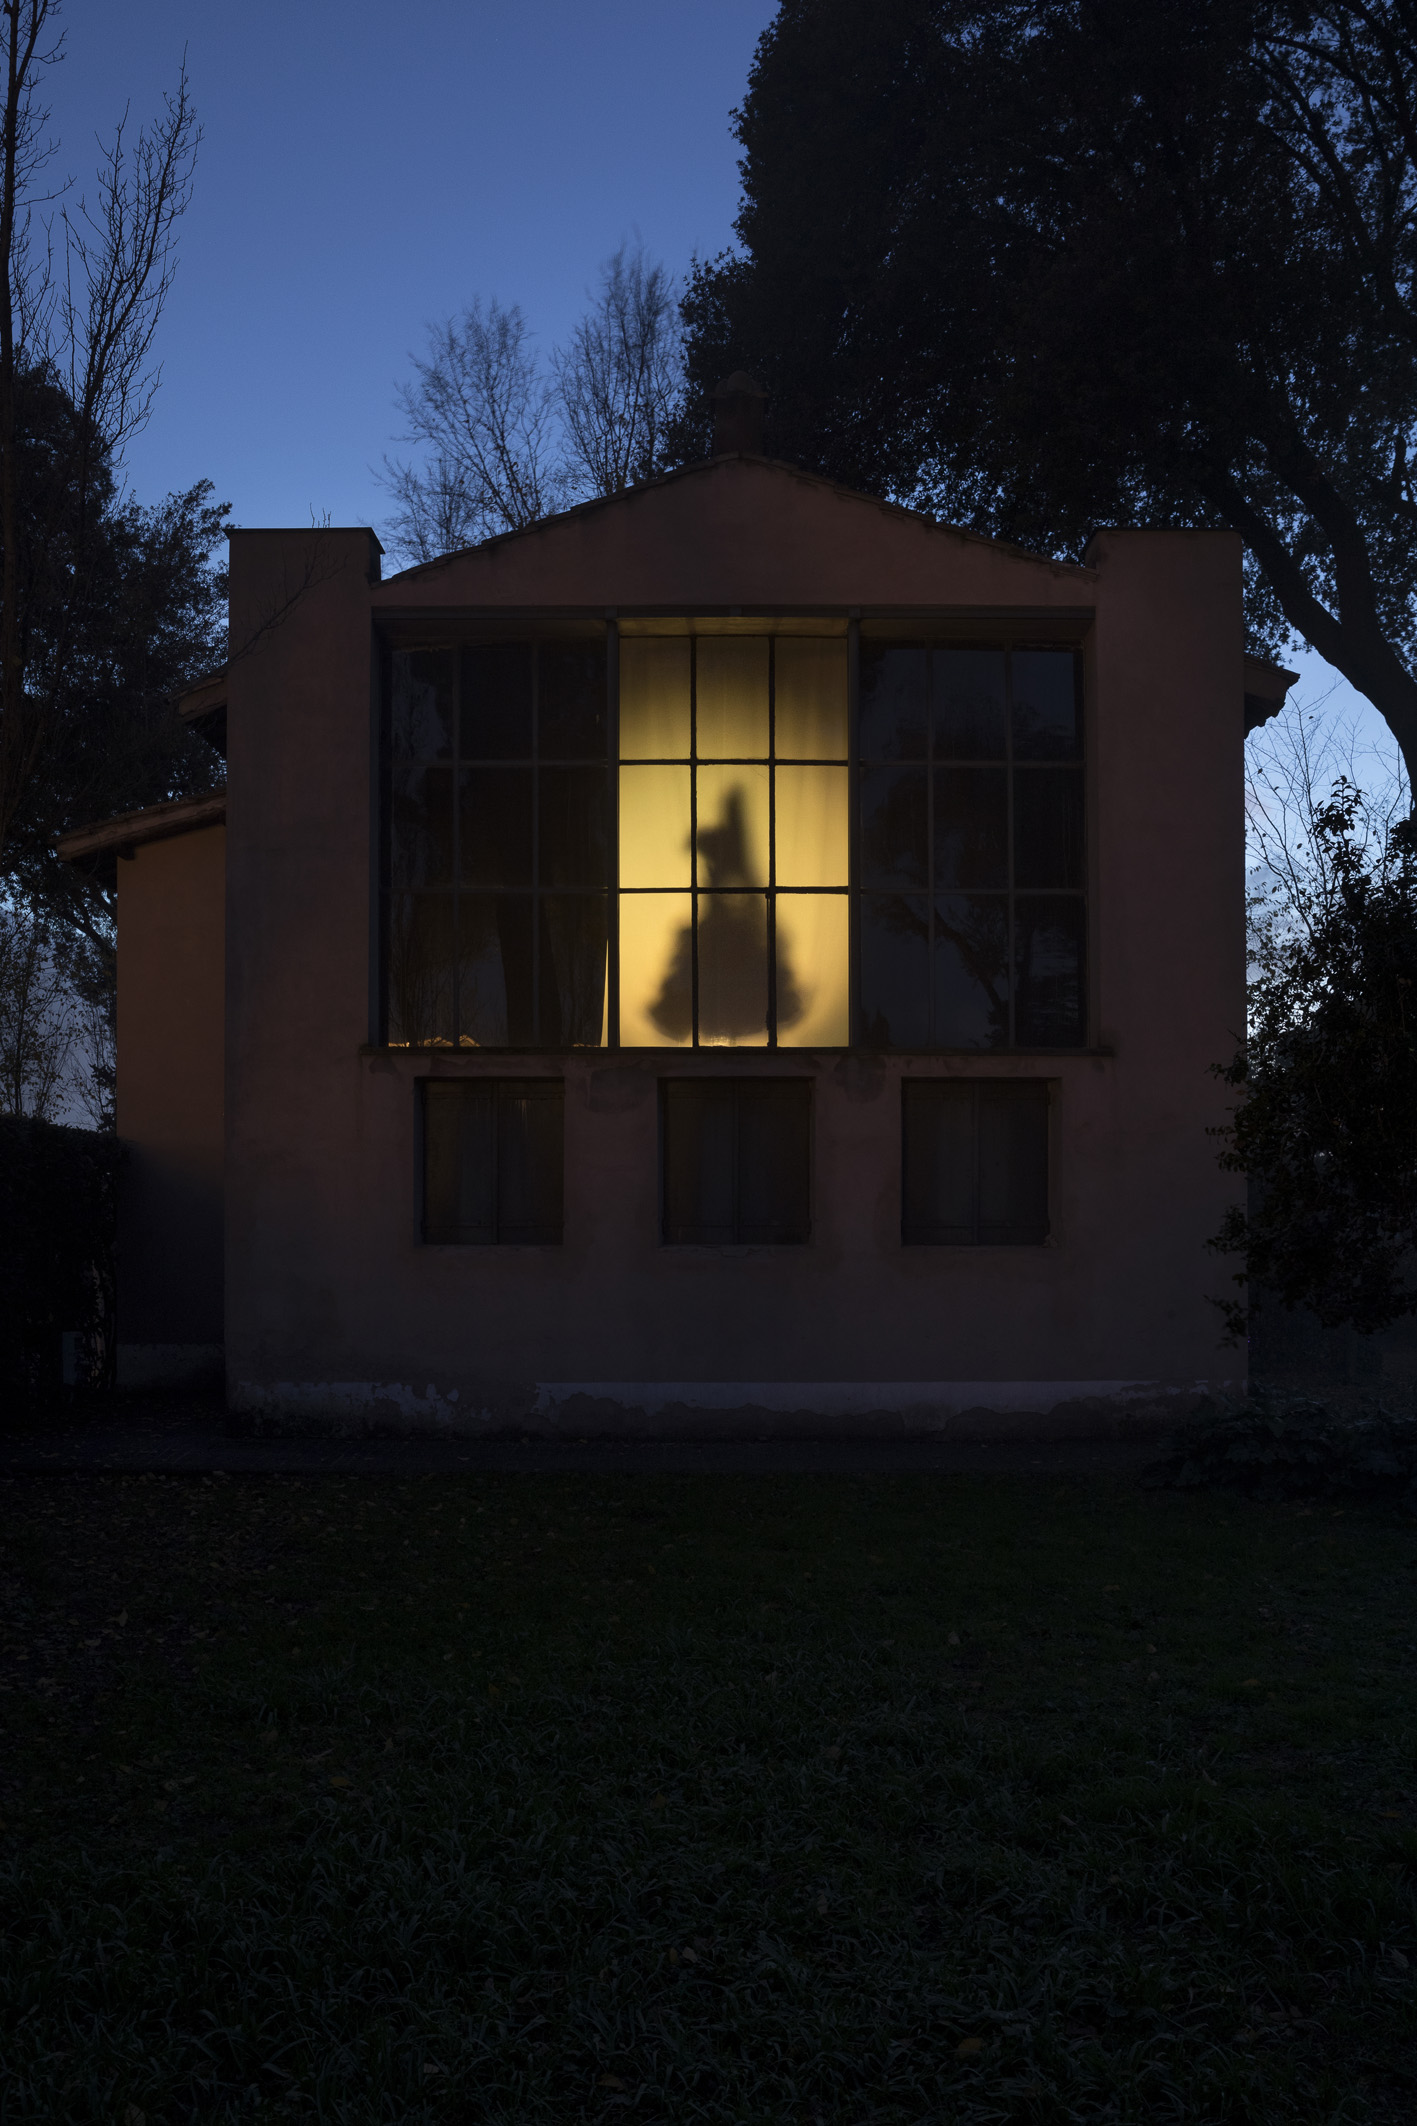 Una mostra aperta di notte a Villa Medici  Artribune